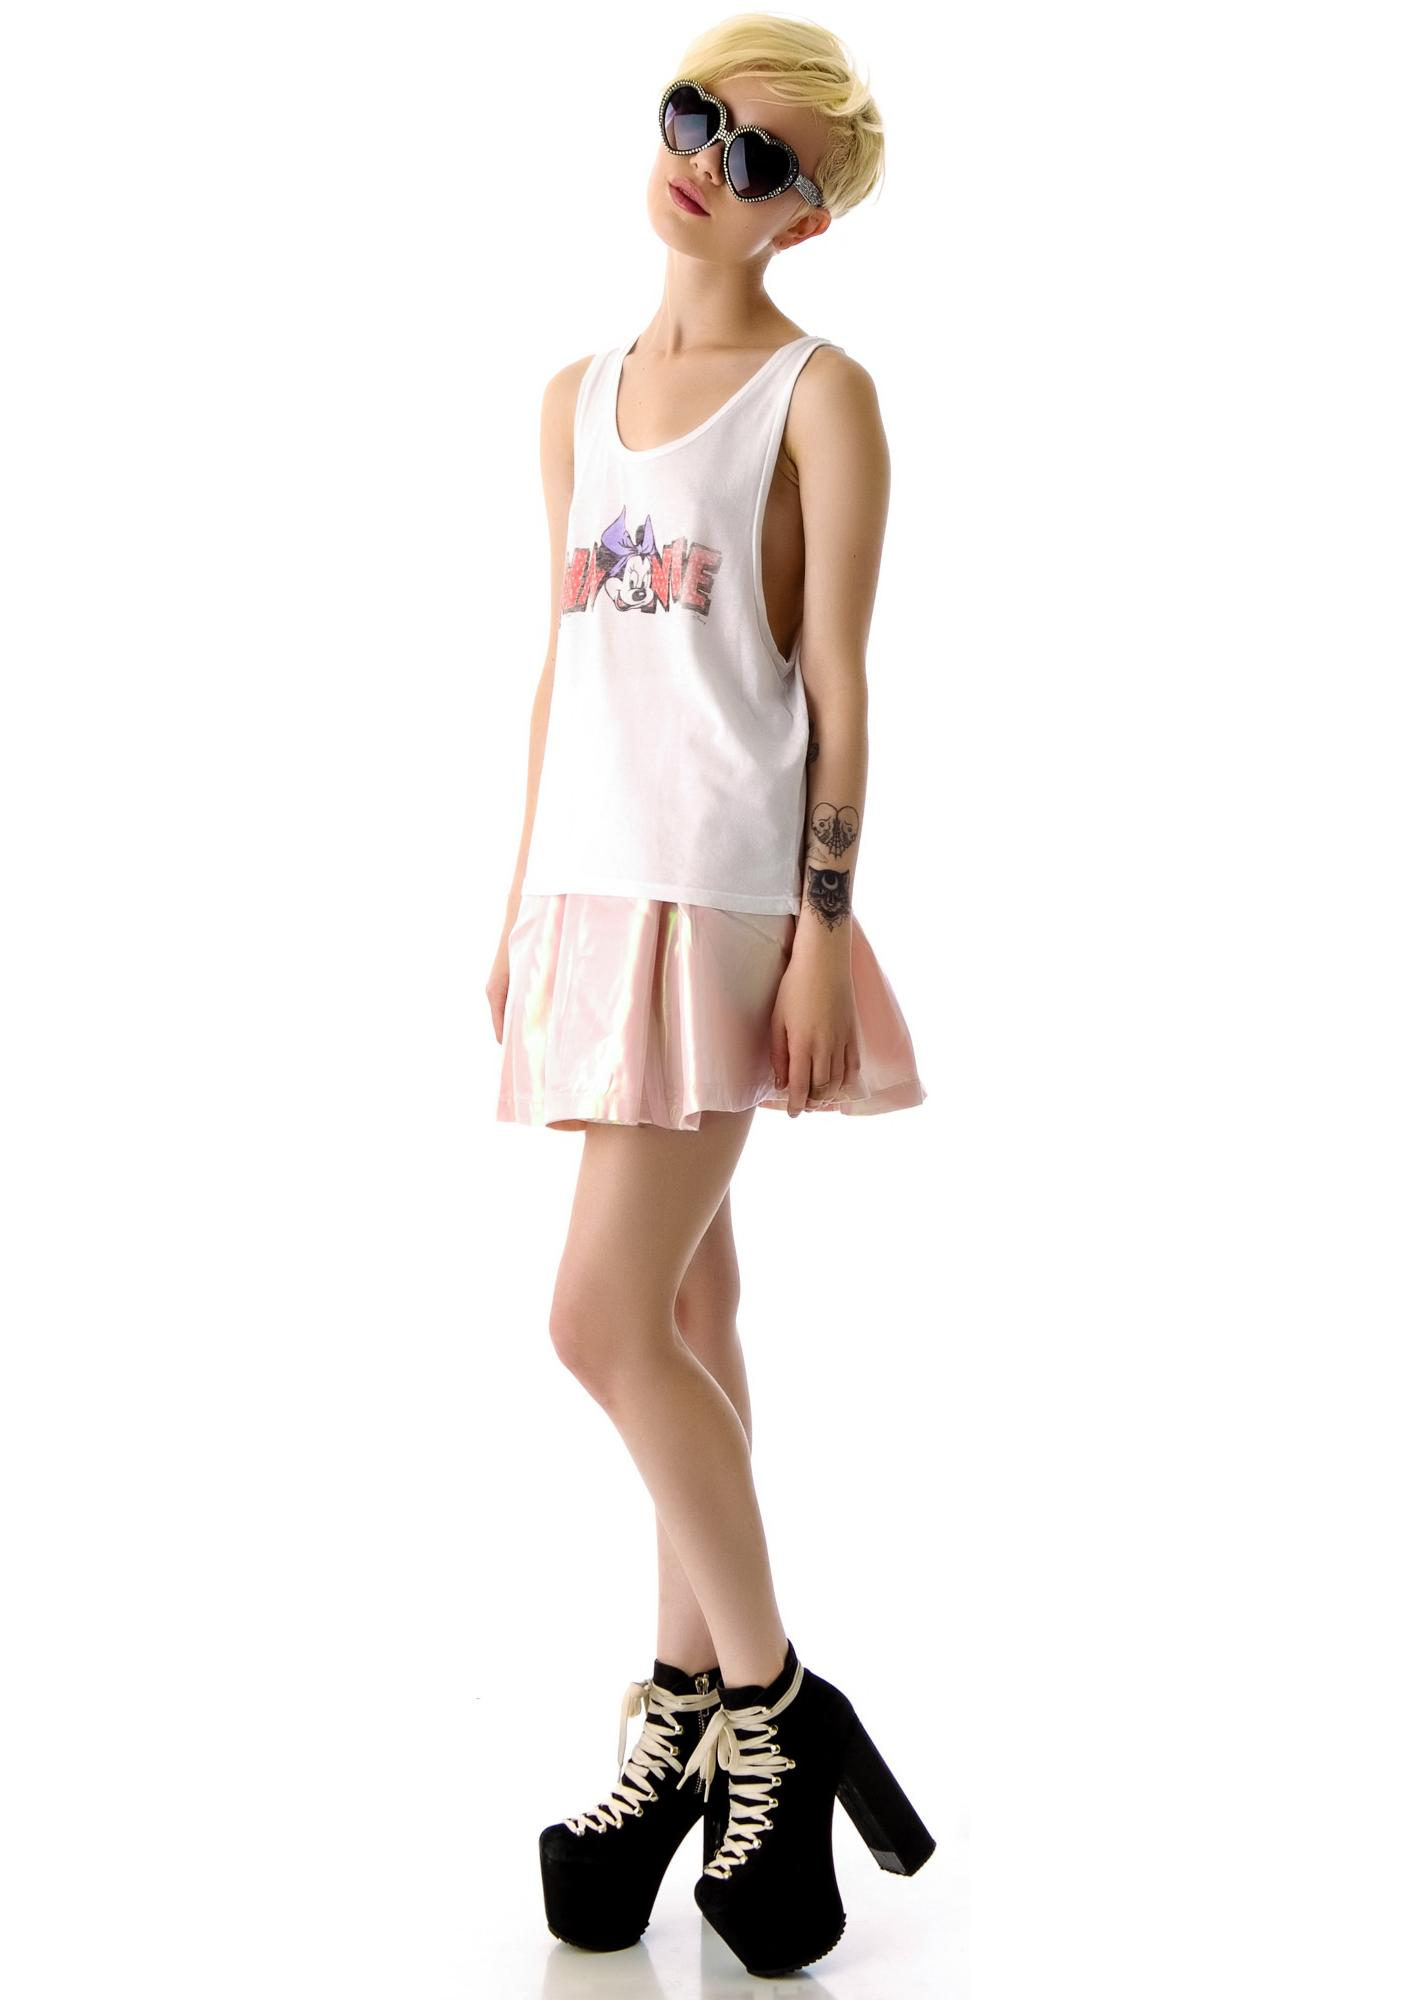 Junk Food Clothing Minnie Easy Rider Tank